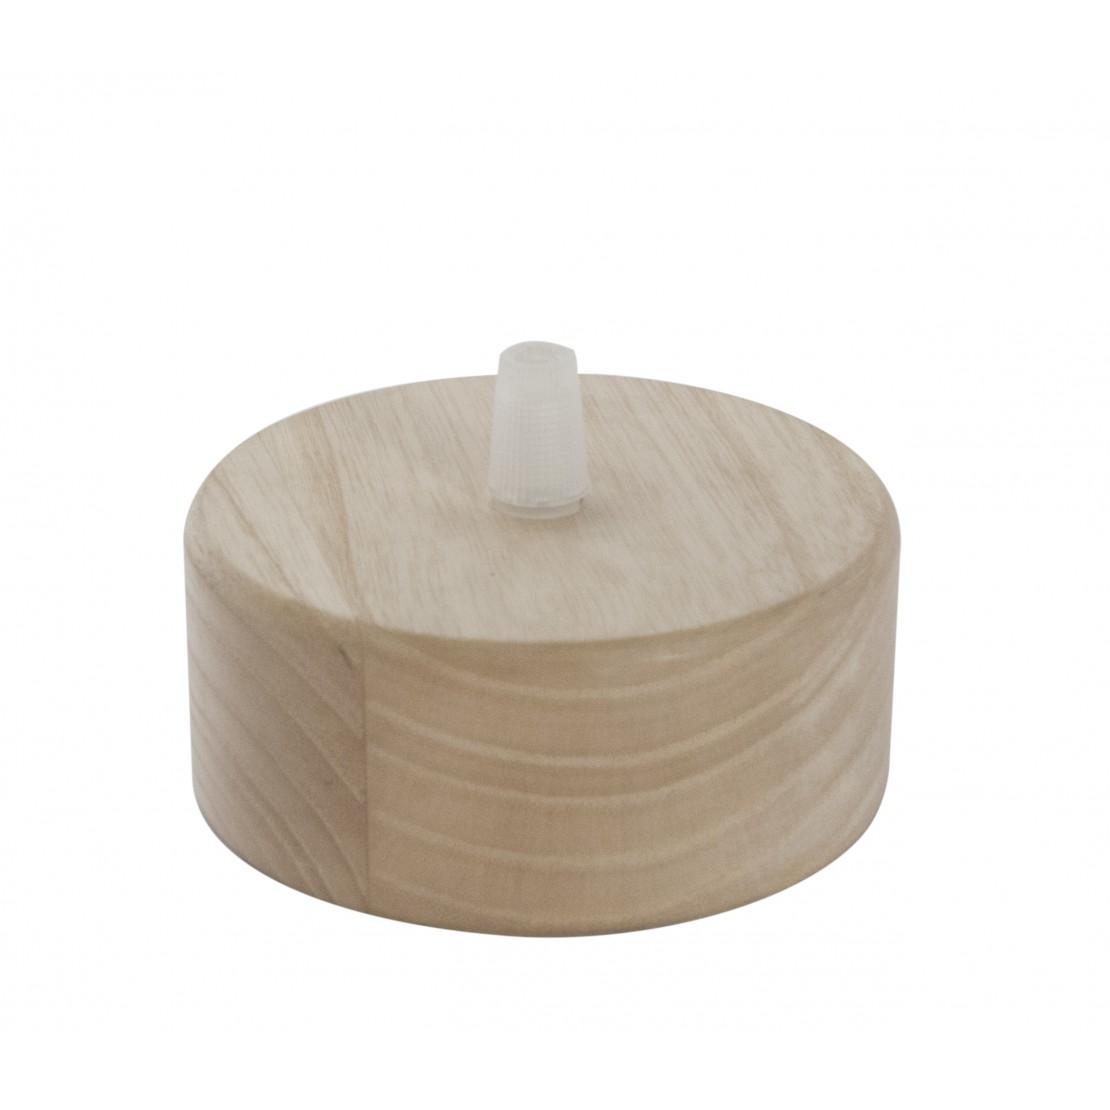 Zocalo - madera